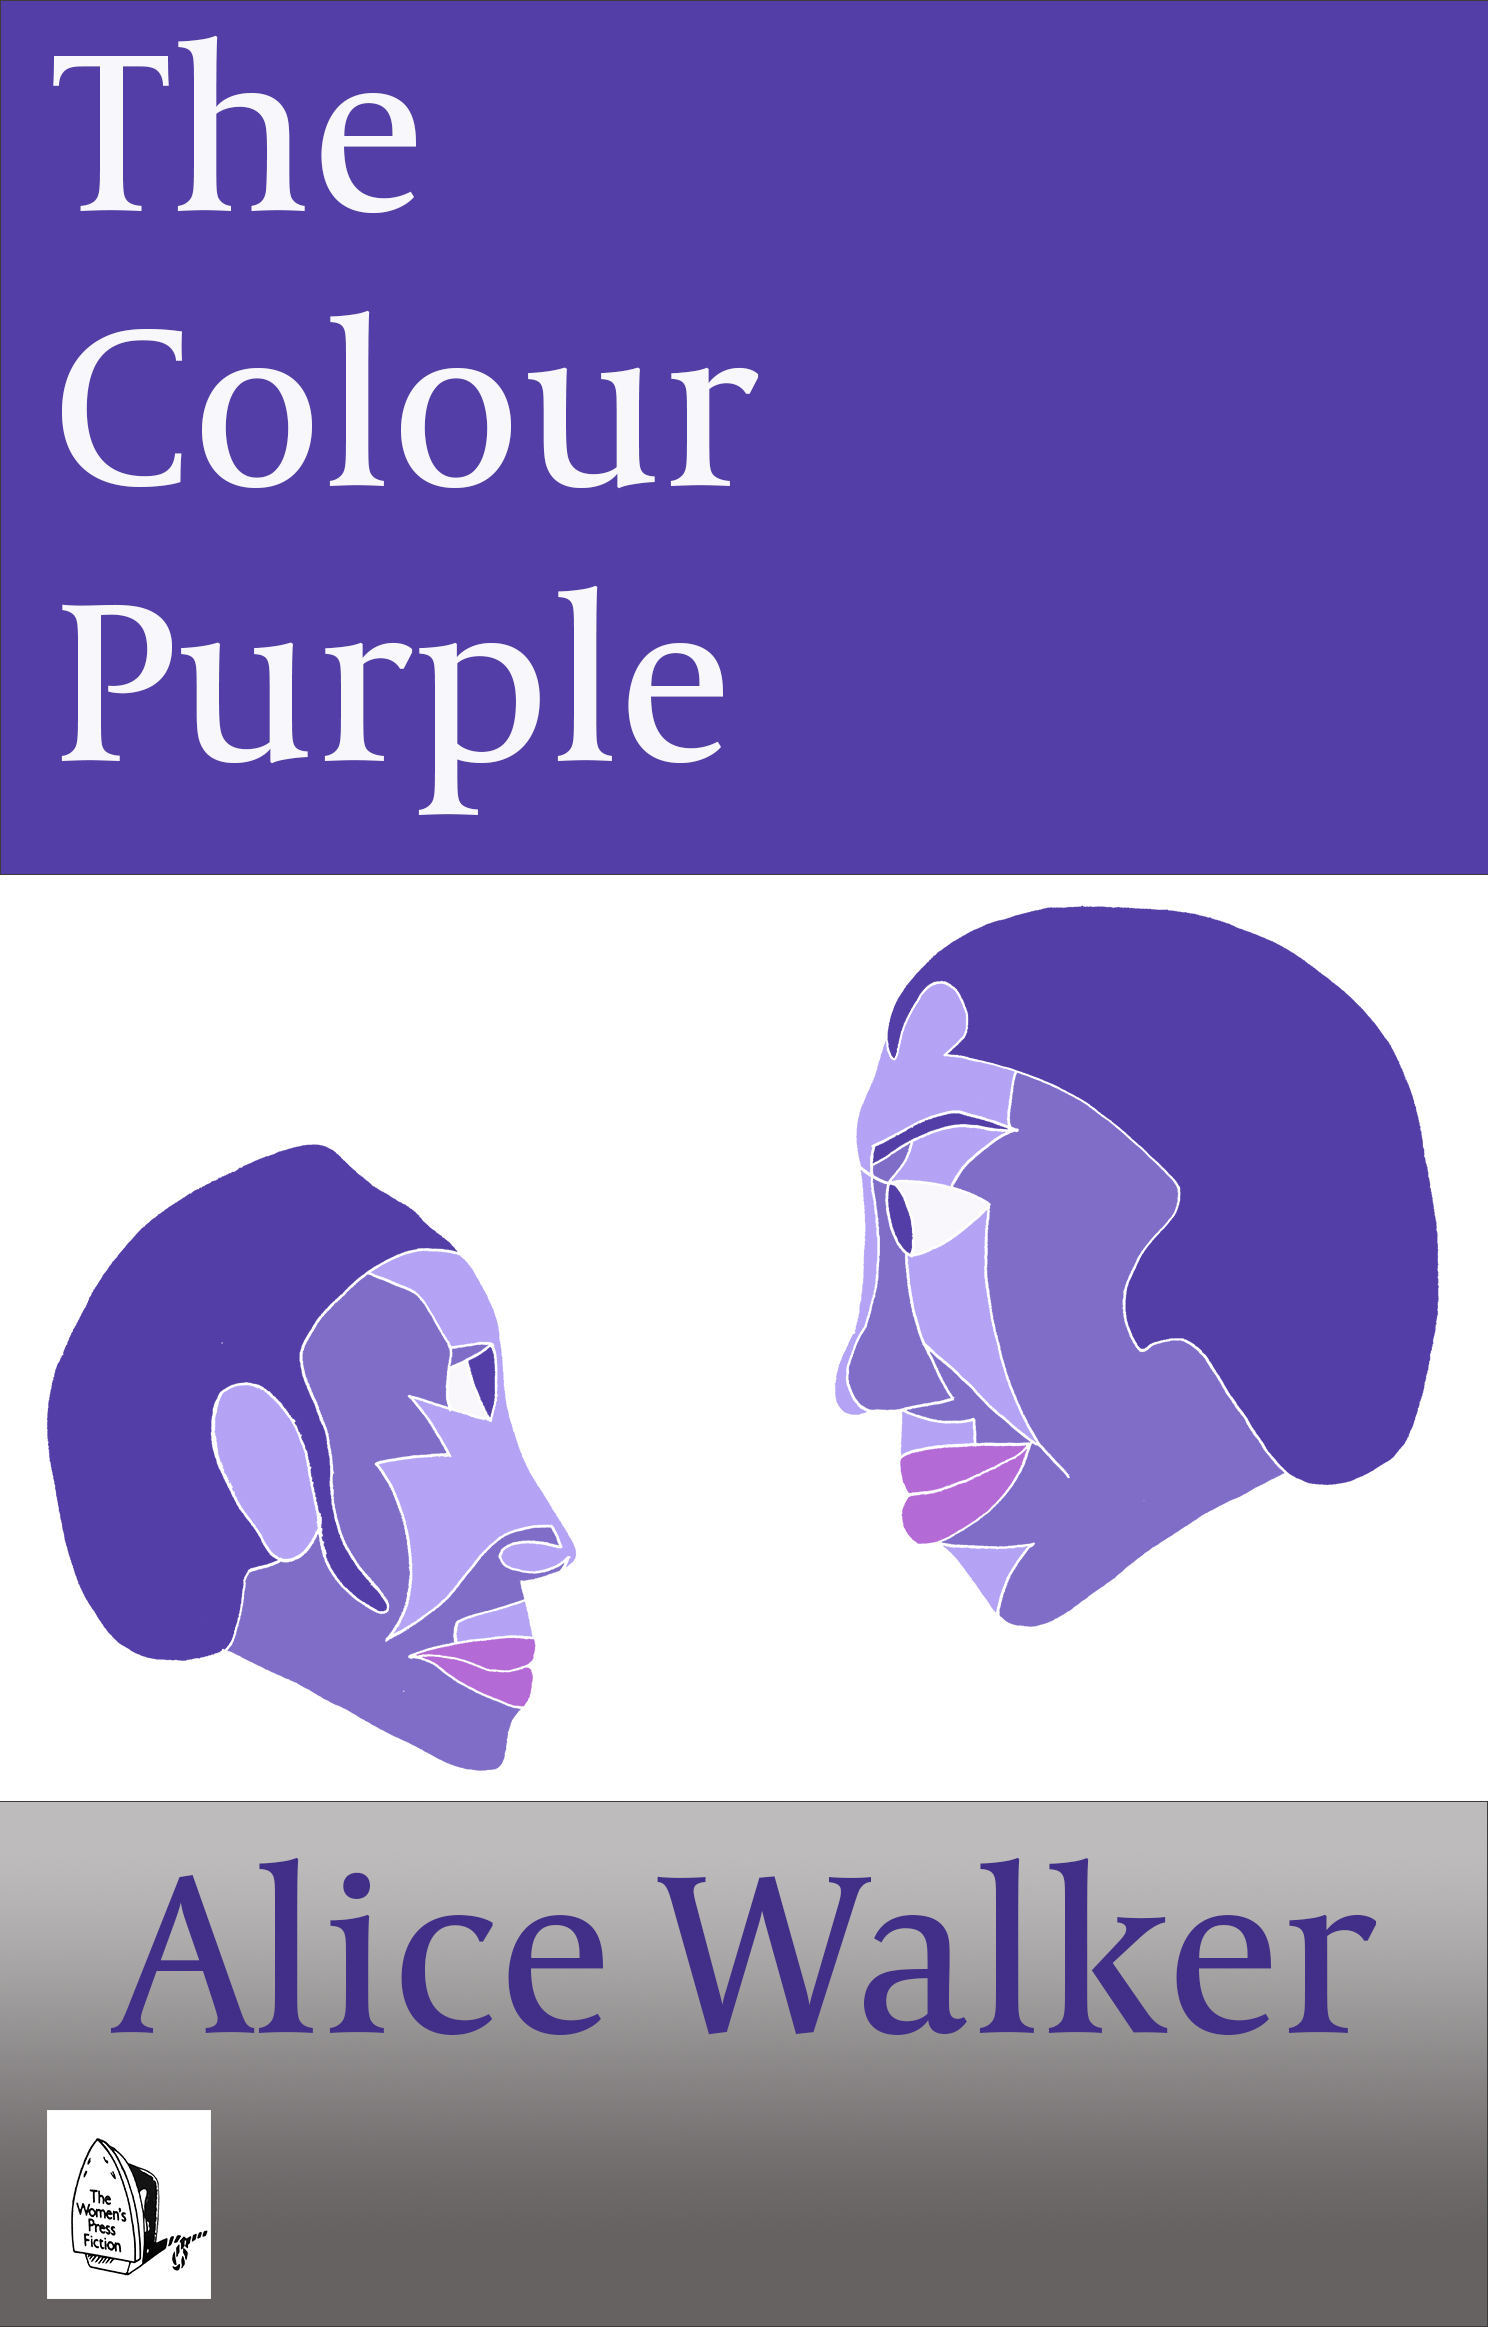 The colour purple cover 3.jpg